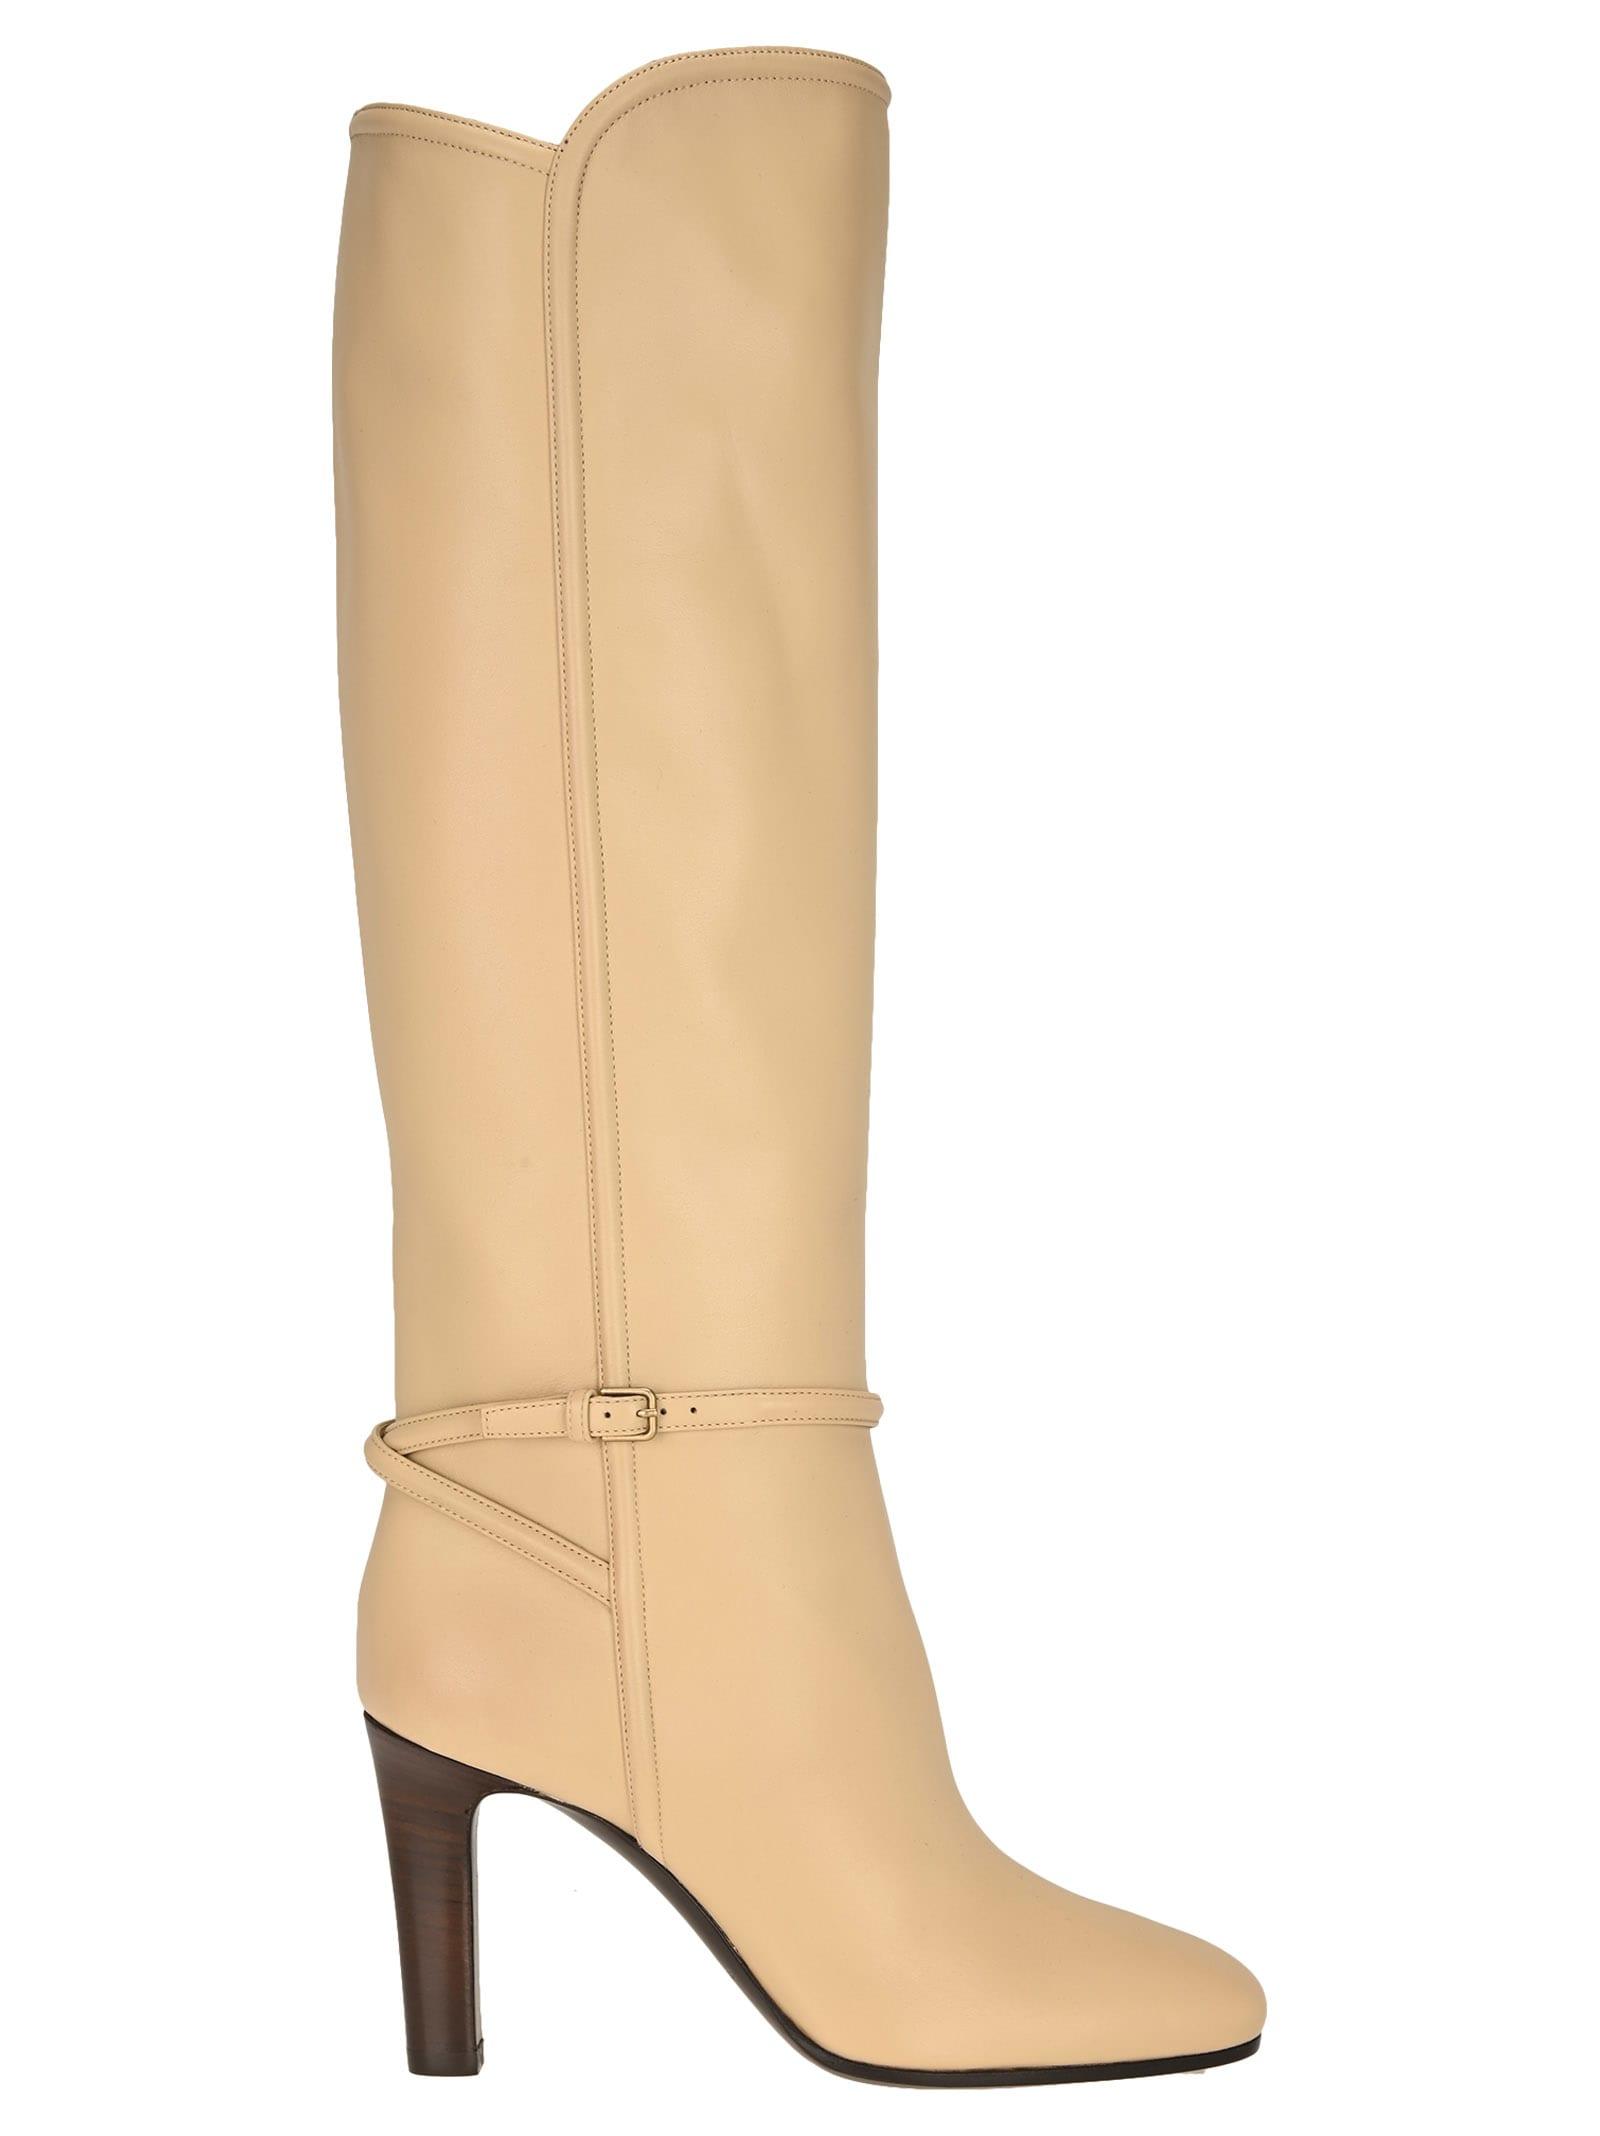 Saint Laurent High heels JANE BOOTS